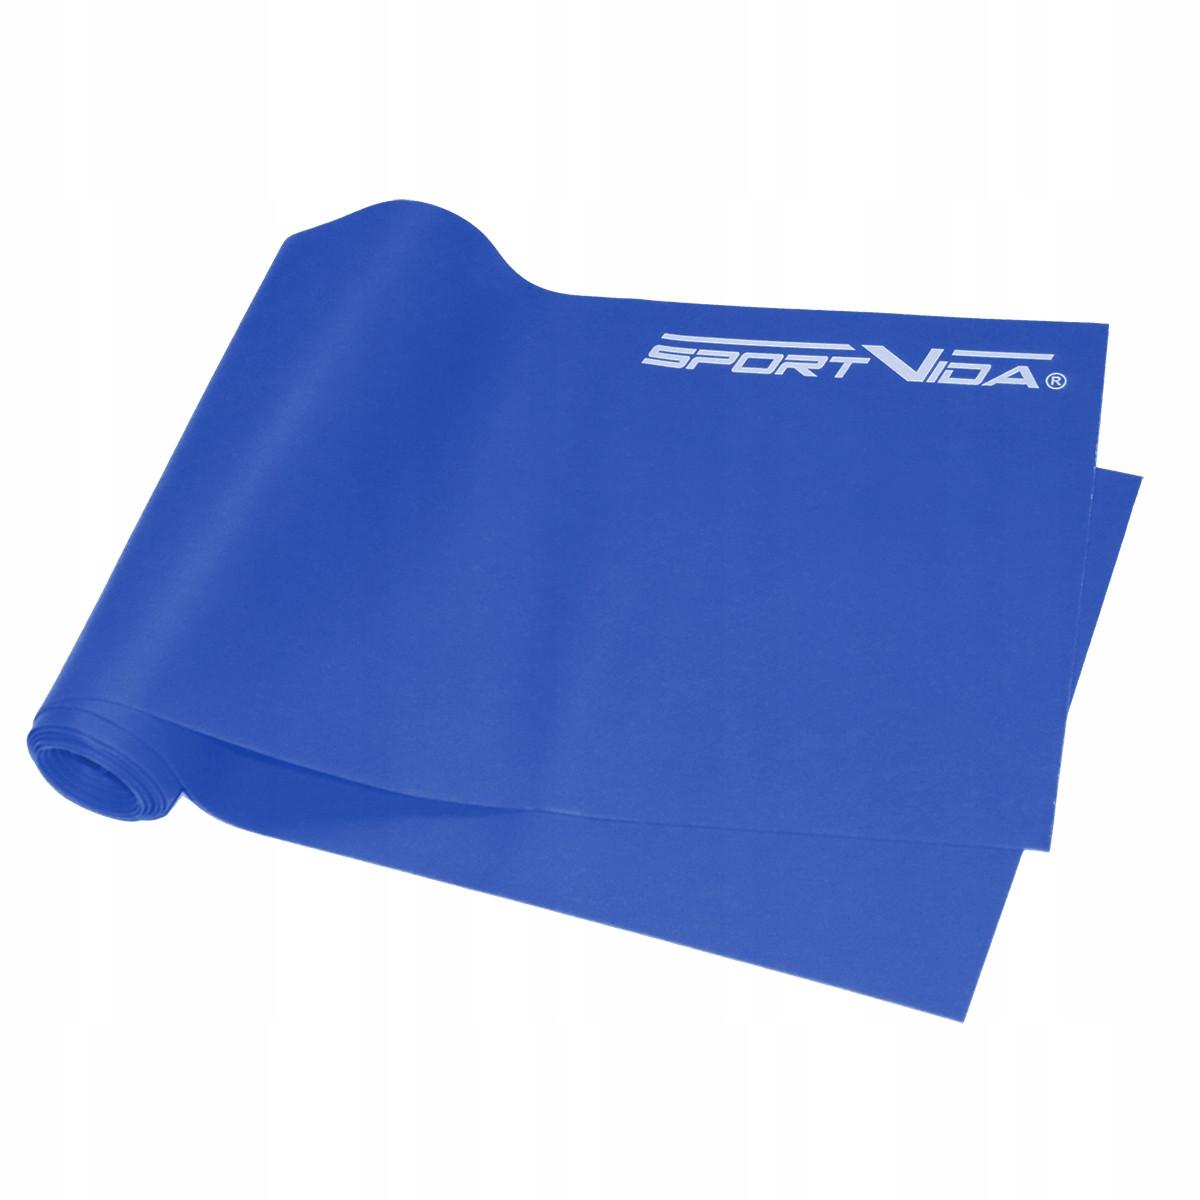 Лента-эспандер для спорта SportVida Flat Stretch Band 200 на 15 см 10-15 кг SV-HK0186 SKL41-227843